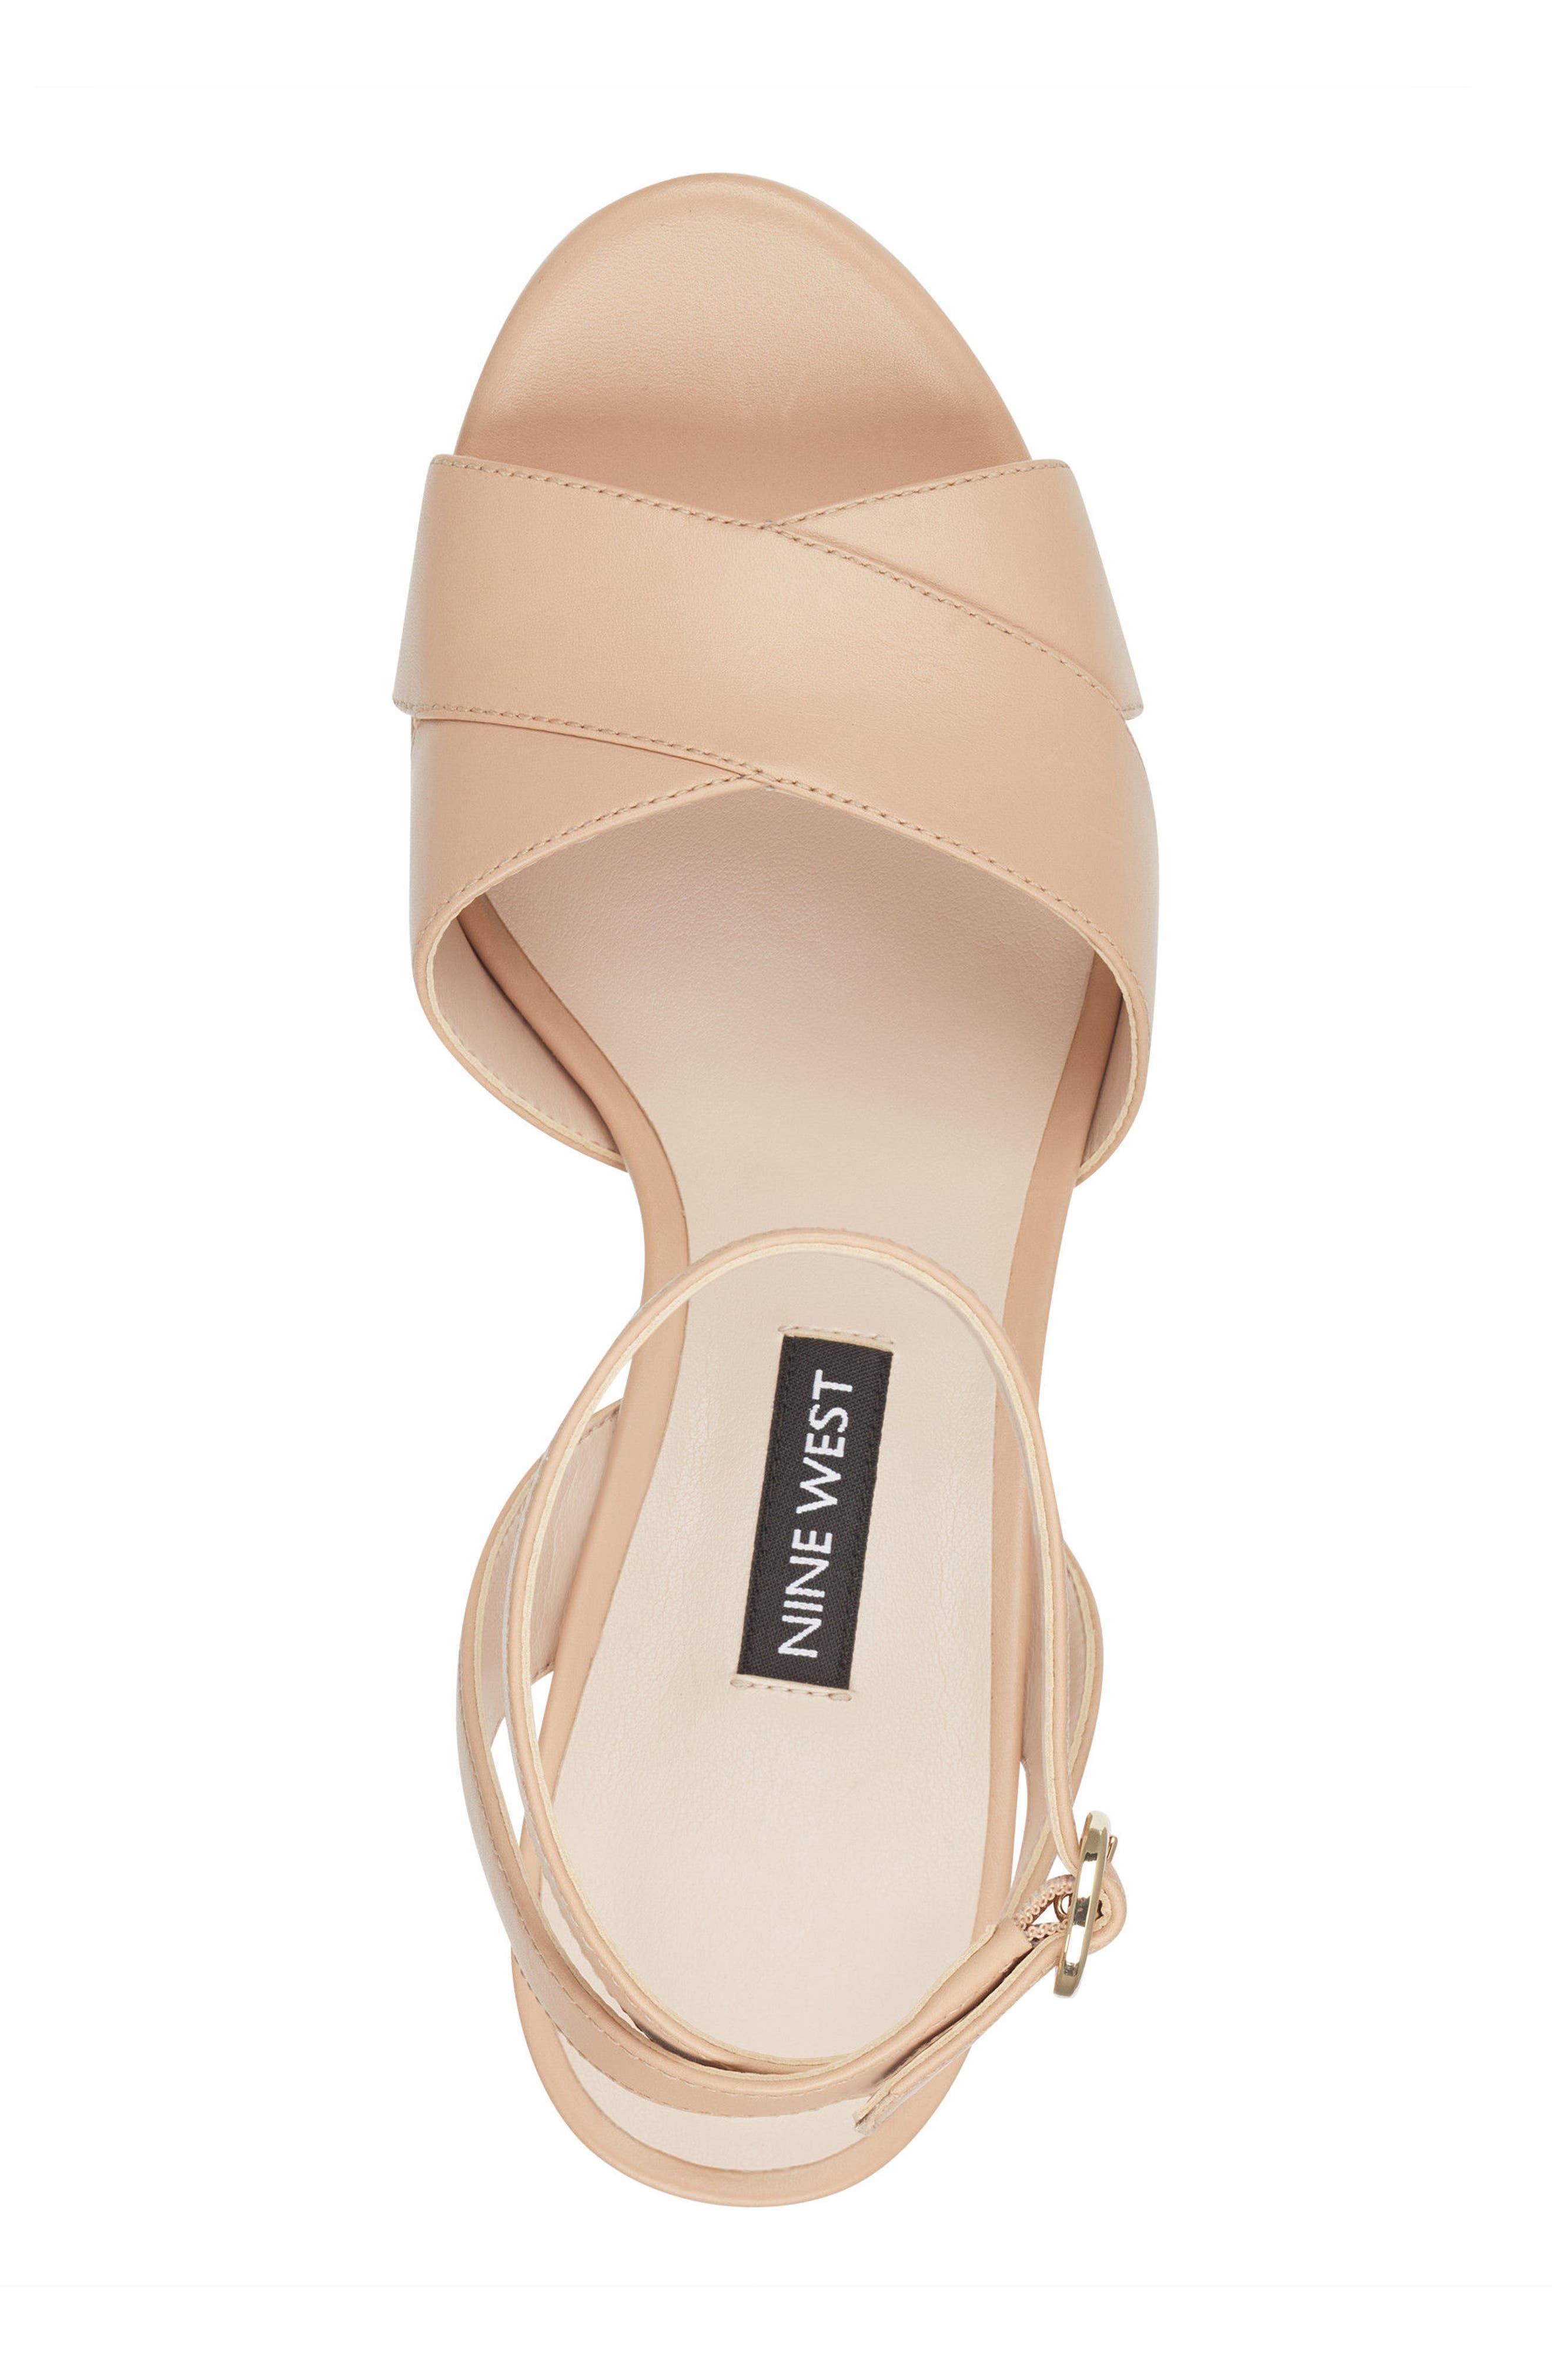 Quisha Ankle Strap Sandal,                             Alternate thumbnail 5, color,                             LIGHT NATURAL LEATHER